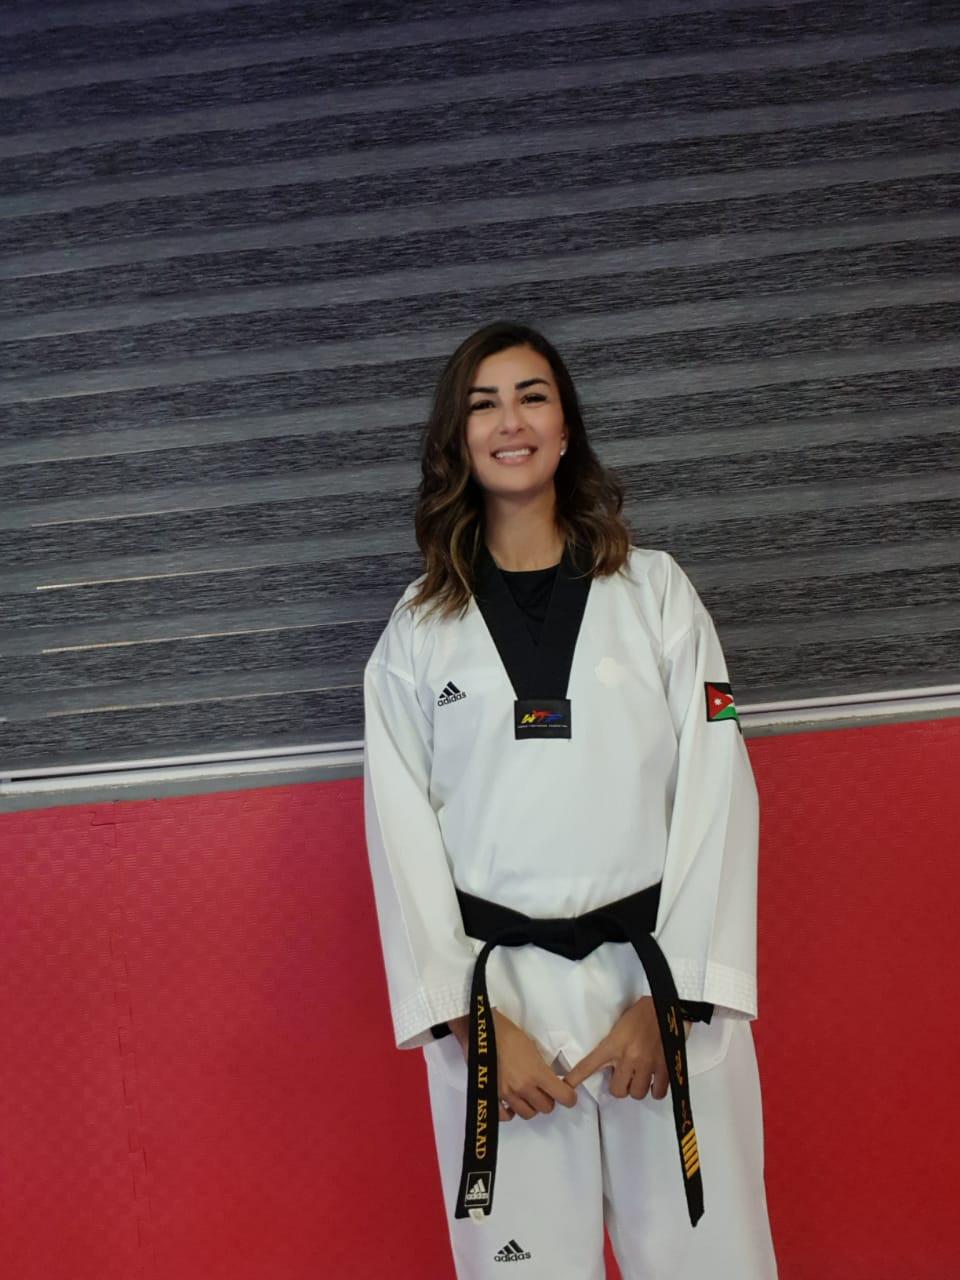 Taekwondo Humanitarian Foundation coordinator to raise funds by climbing Kilimanjaro